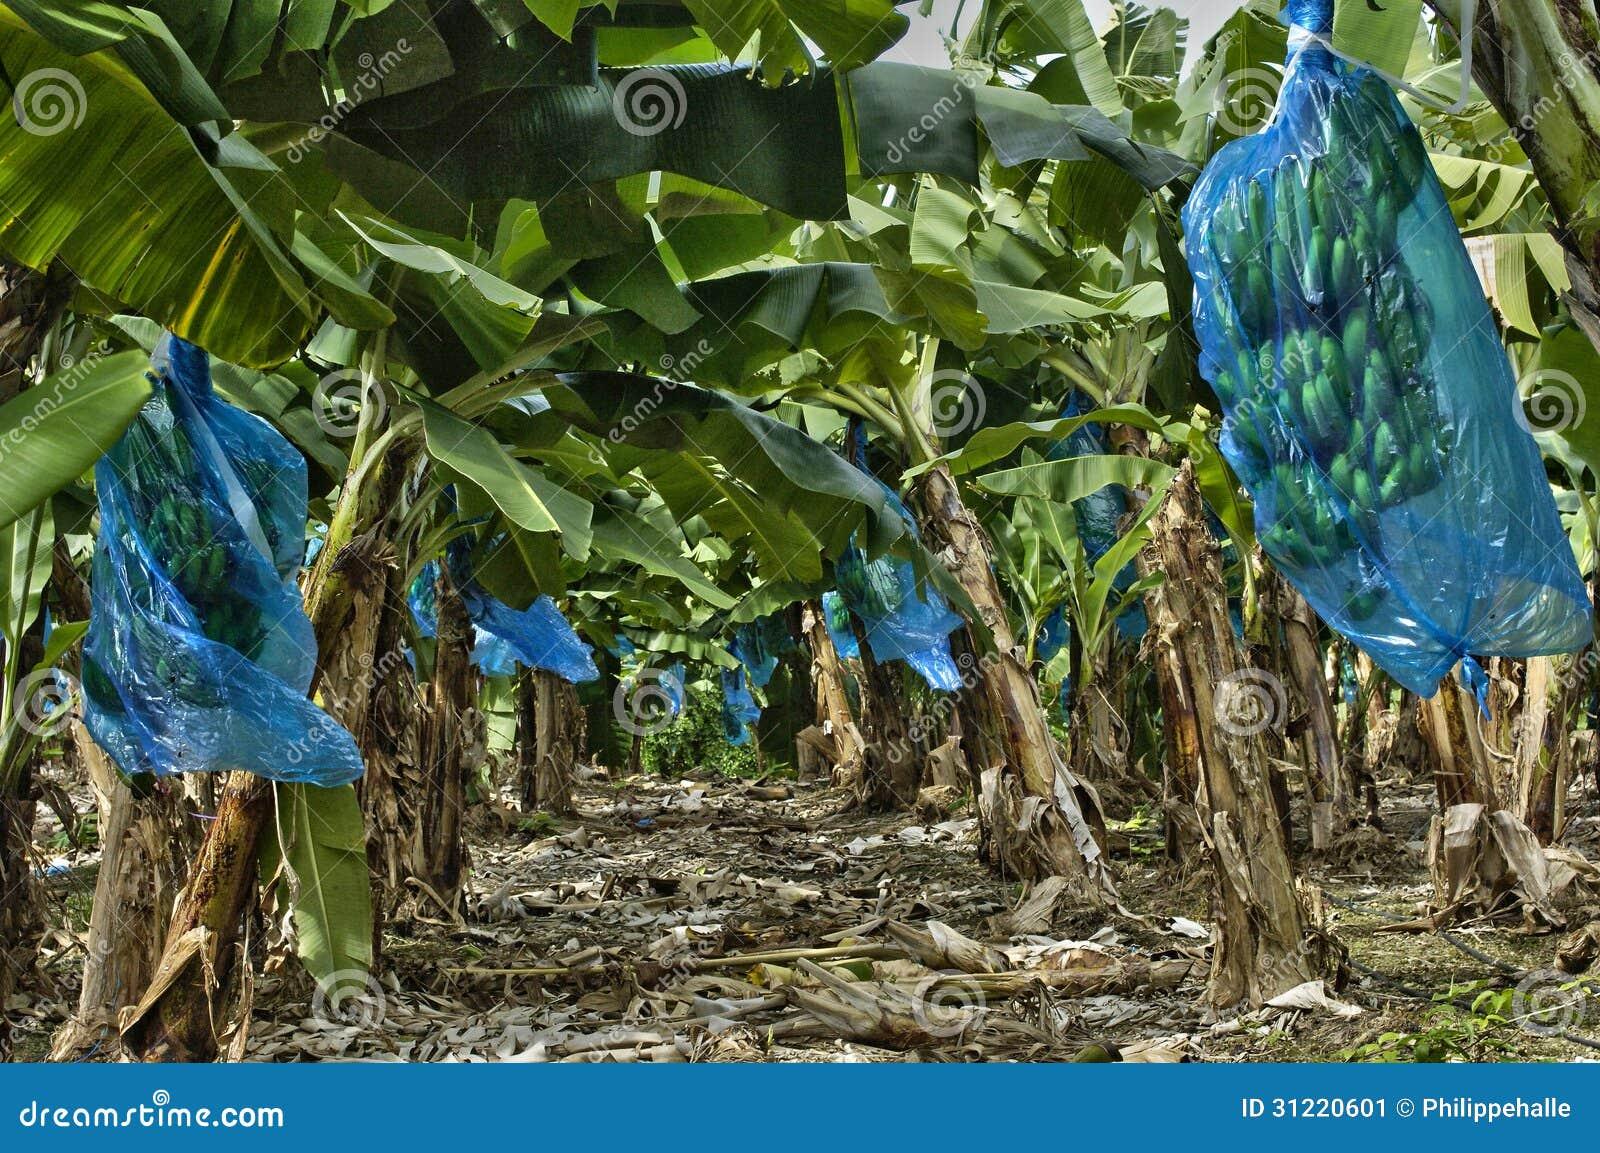 plantation de banane martinique image stock image du outside touristique 31220601. Black Bedroom Furniture Sets. Home Design Ideas